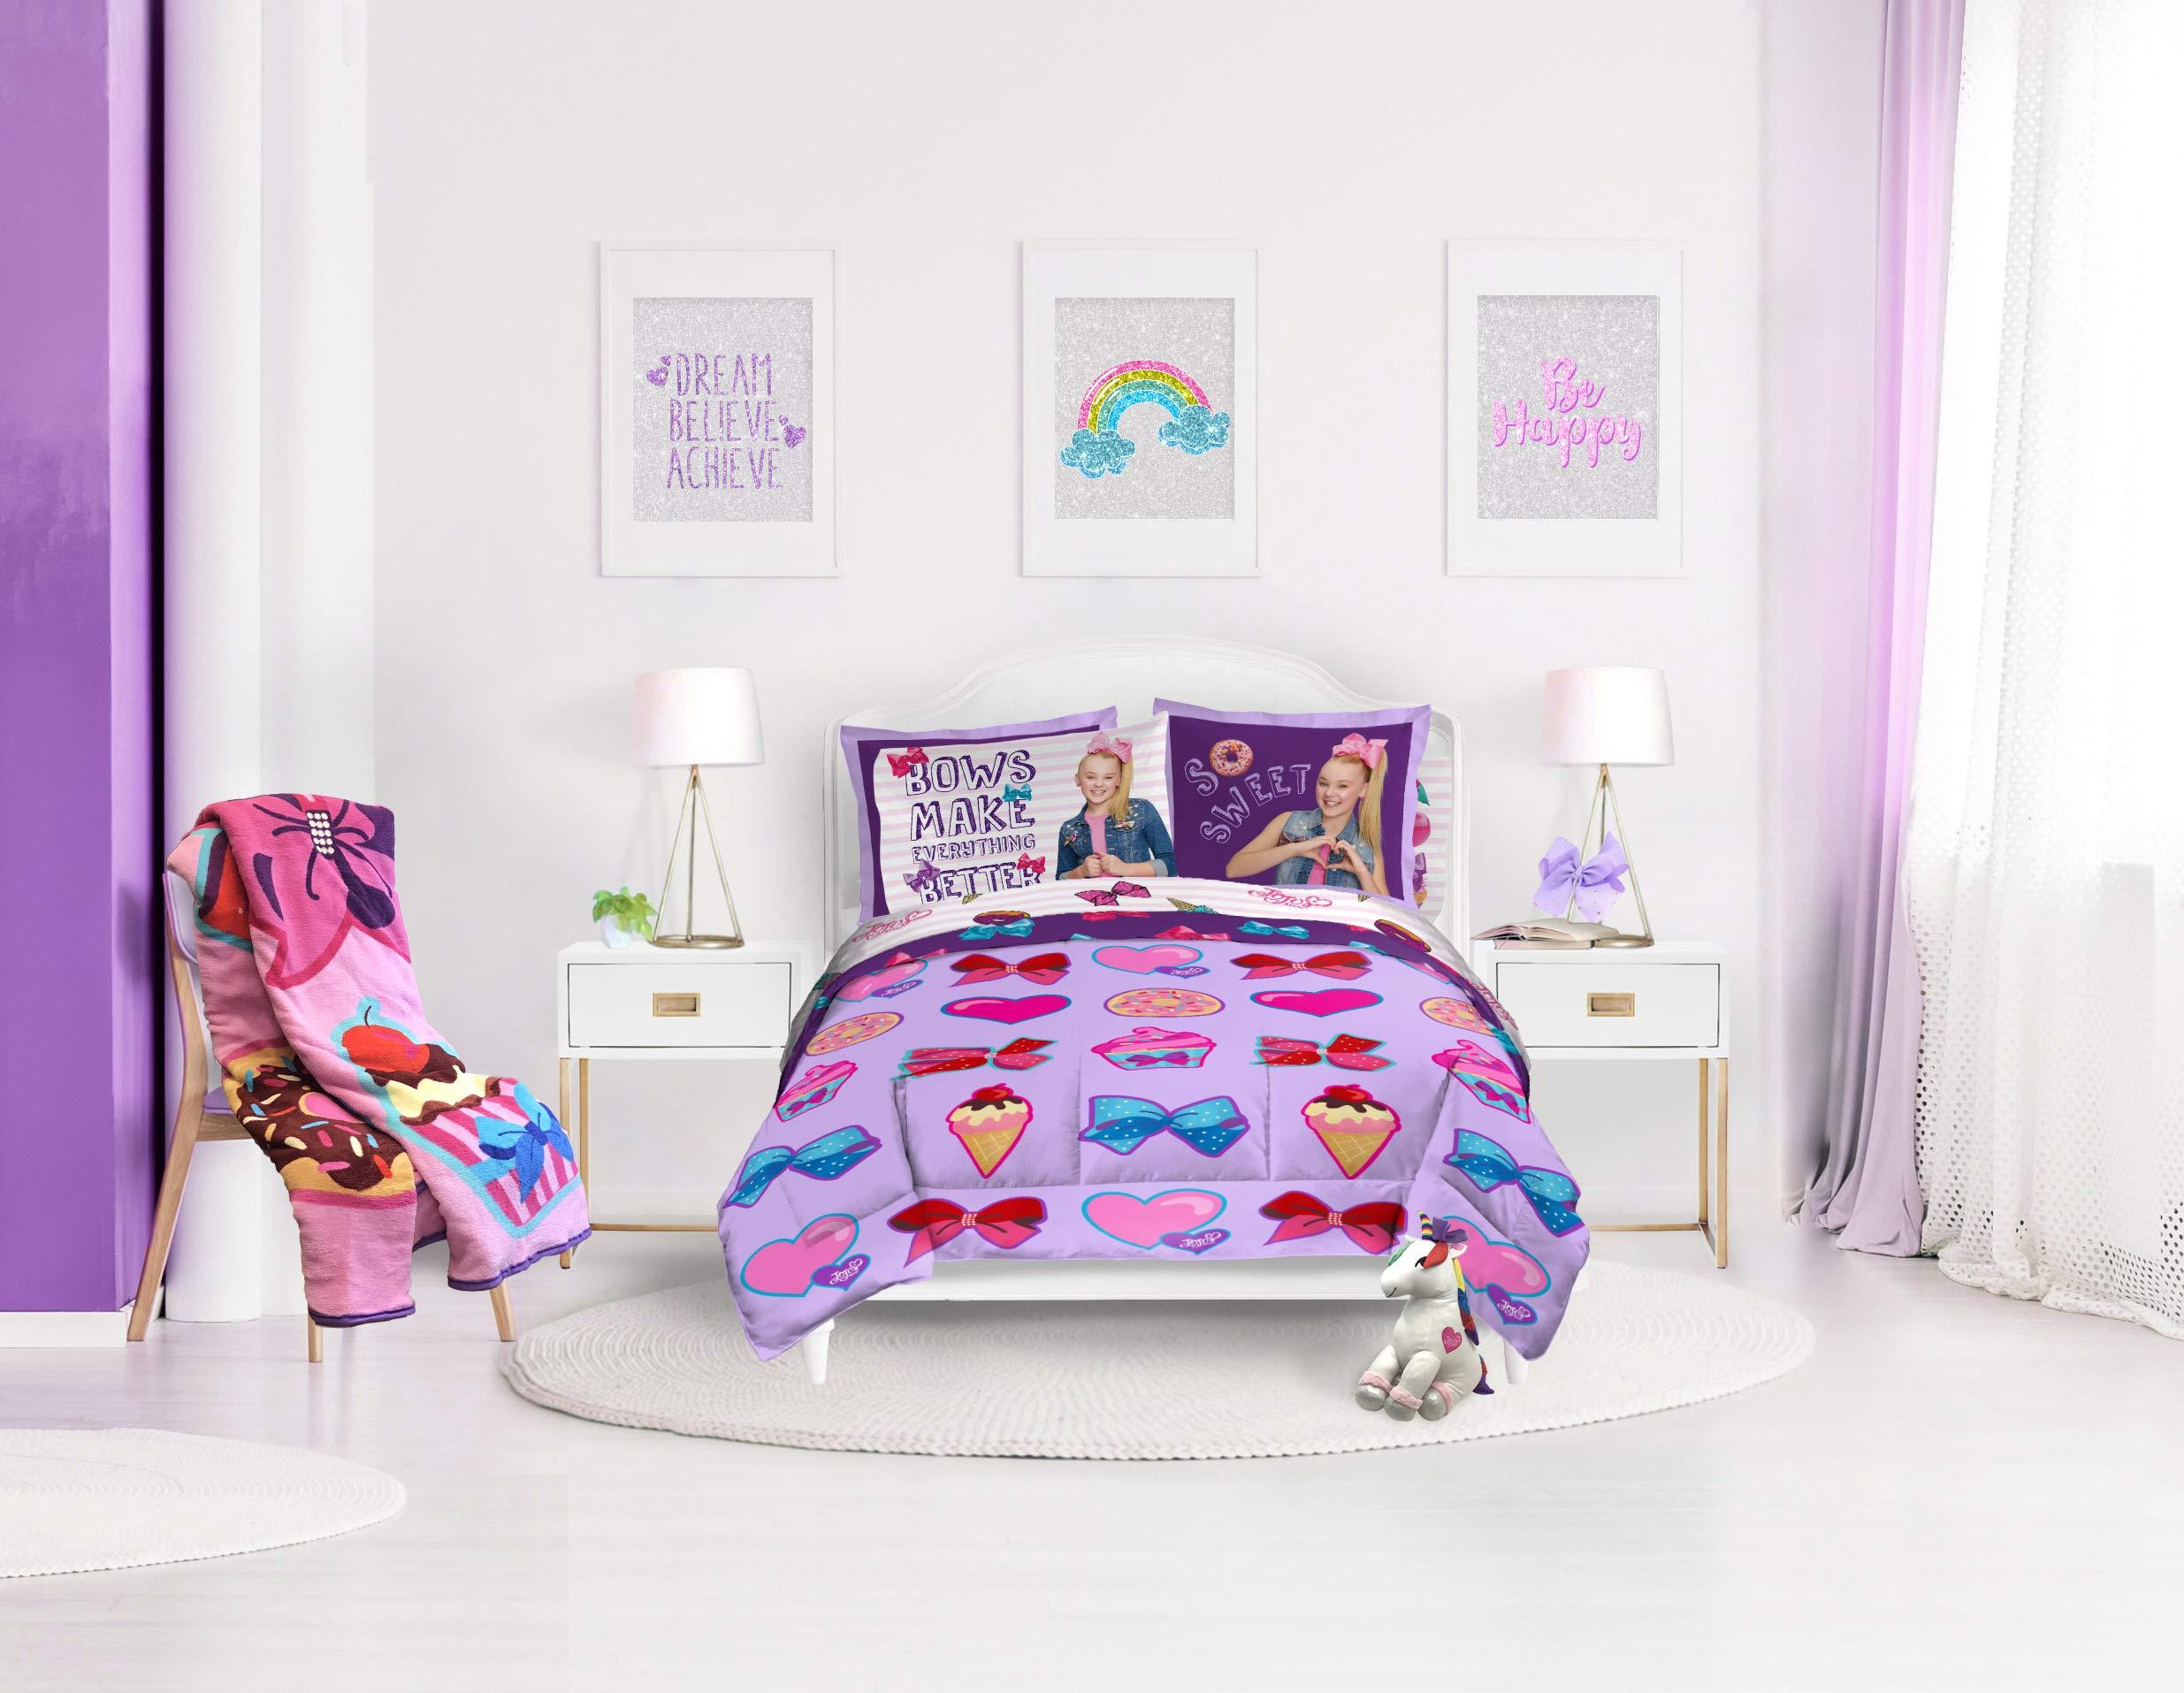 JoJo Siwa Dance Moms LARGE Plush Pillow Buddy Rainbow Unicorn Plush Nickelodeon